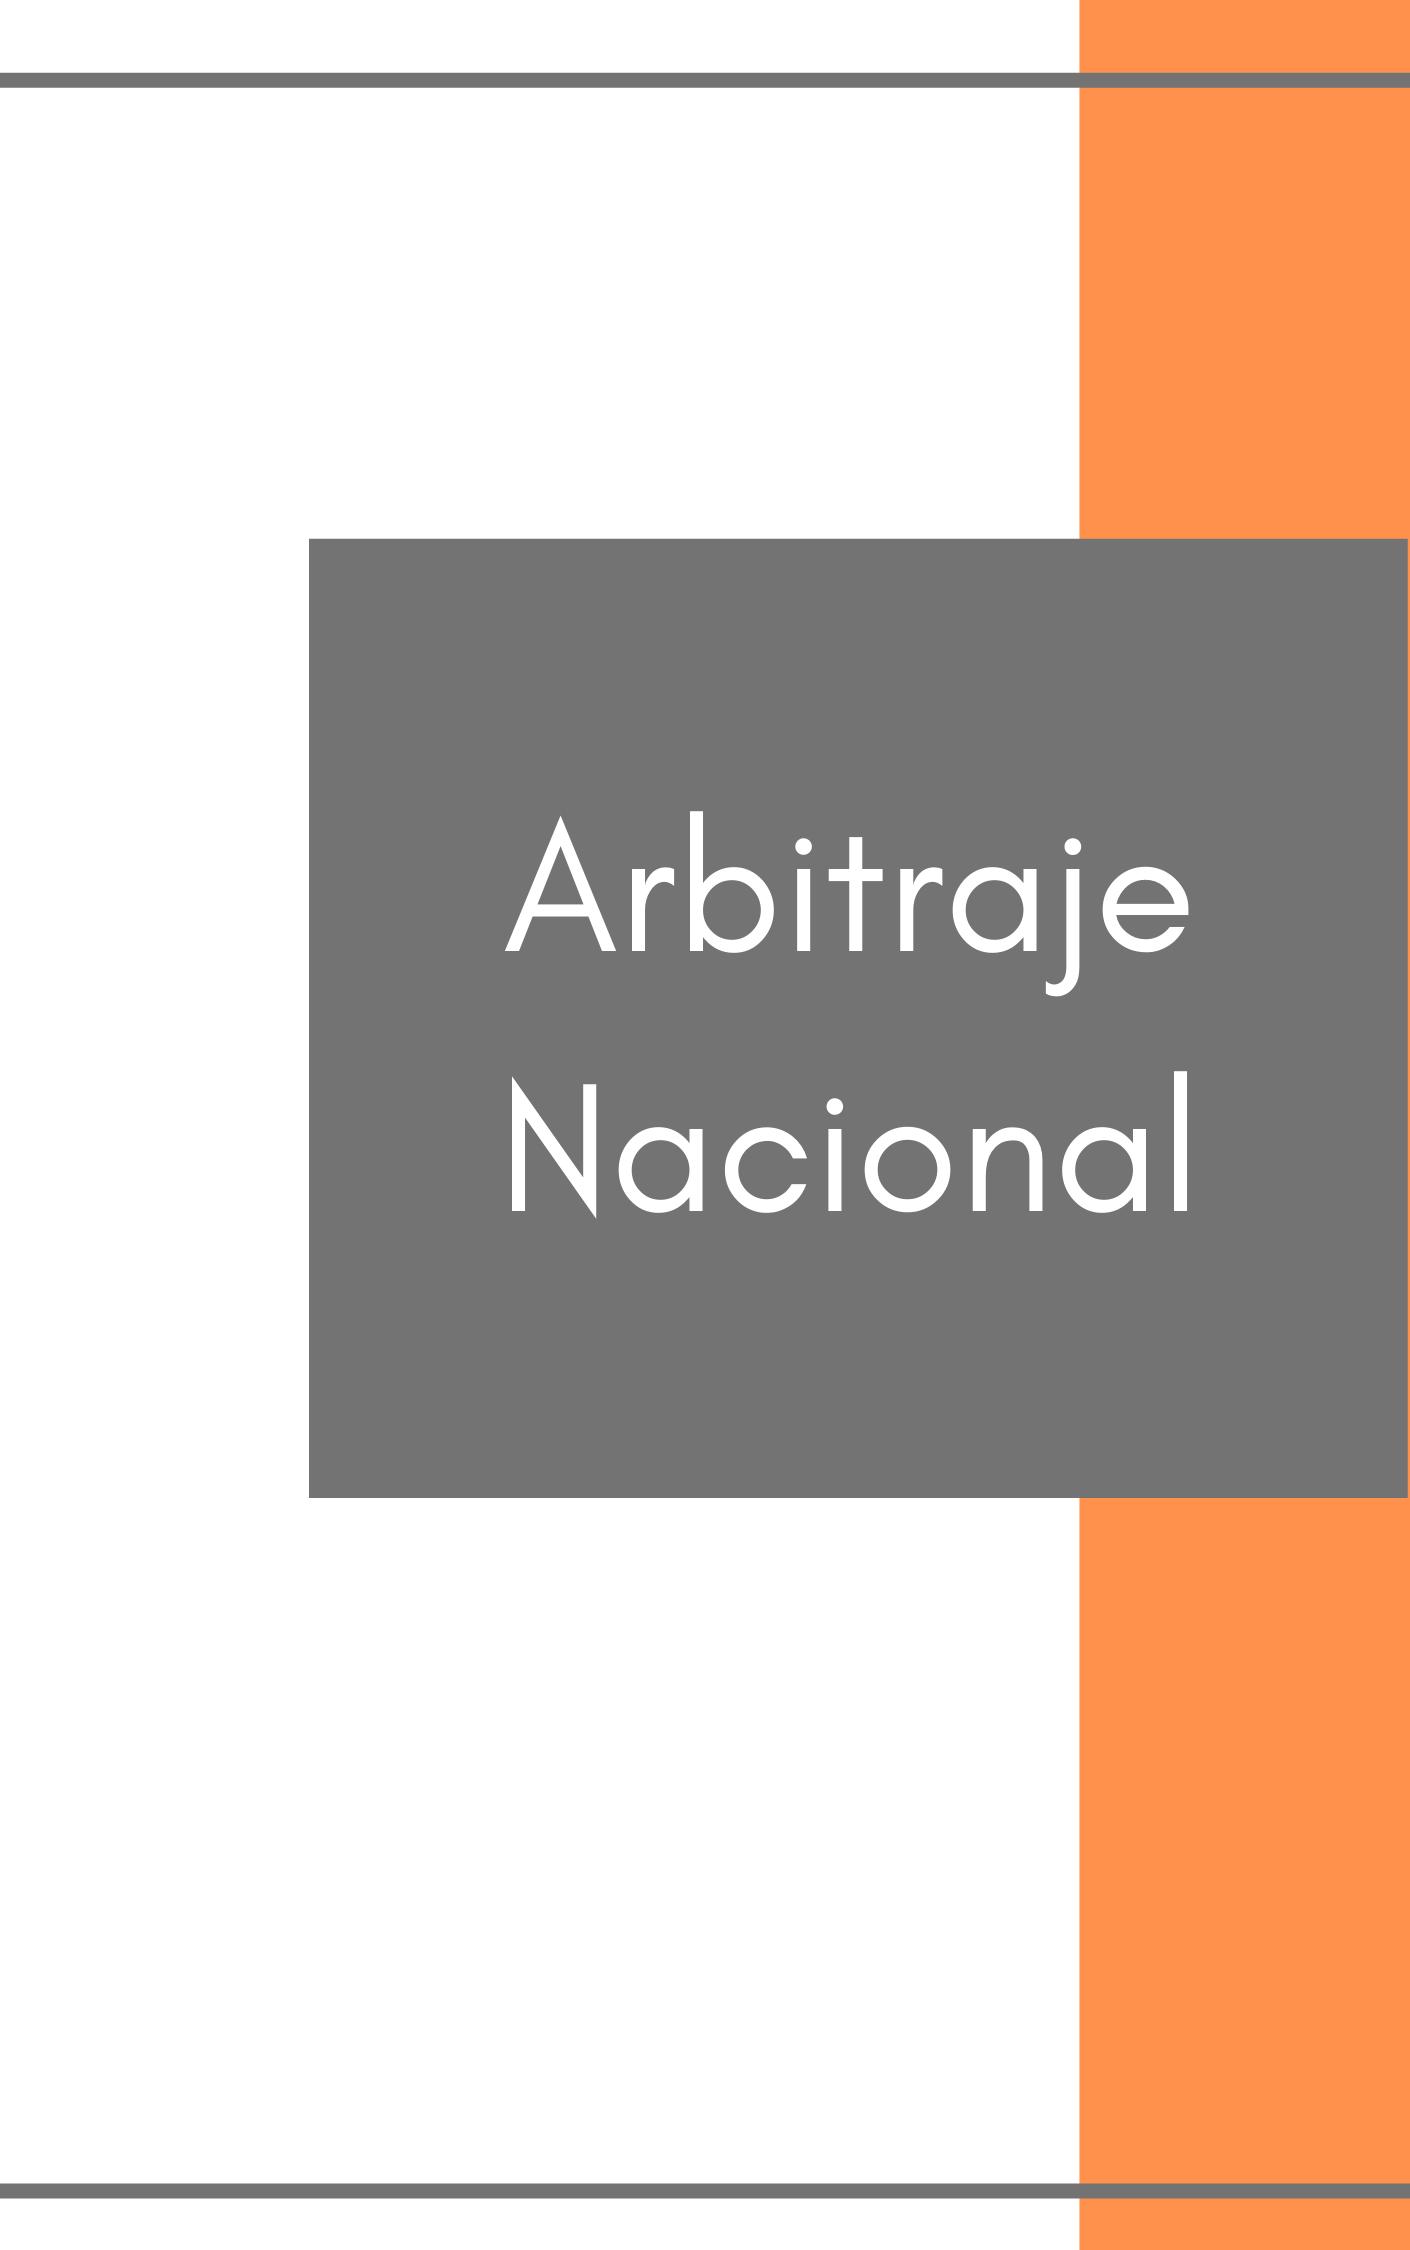 National Arbitration